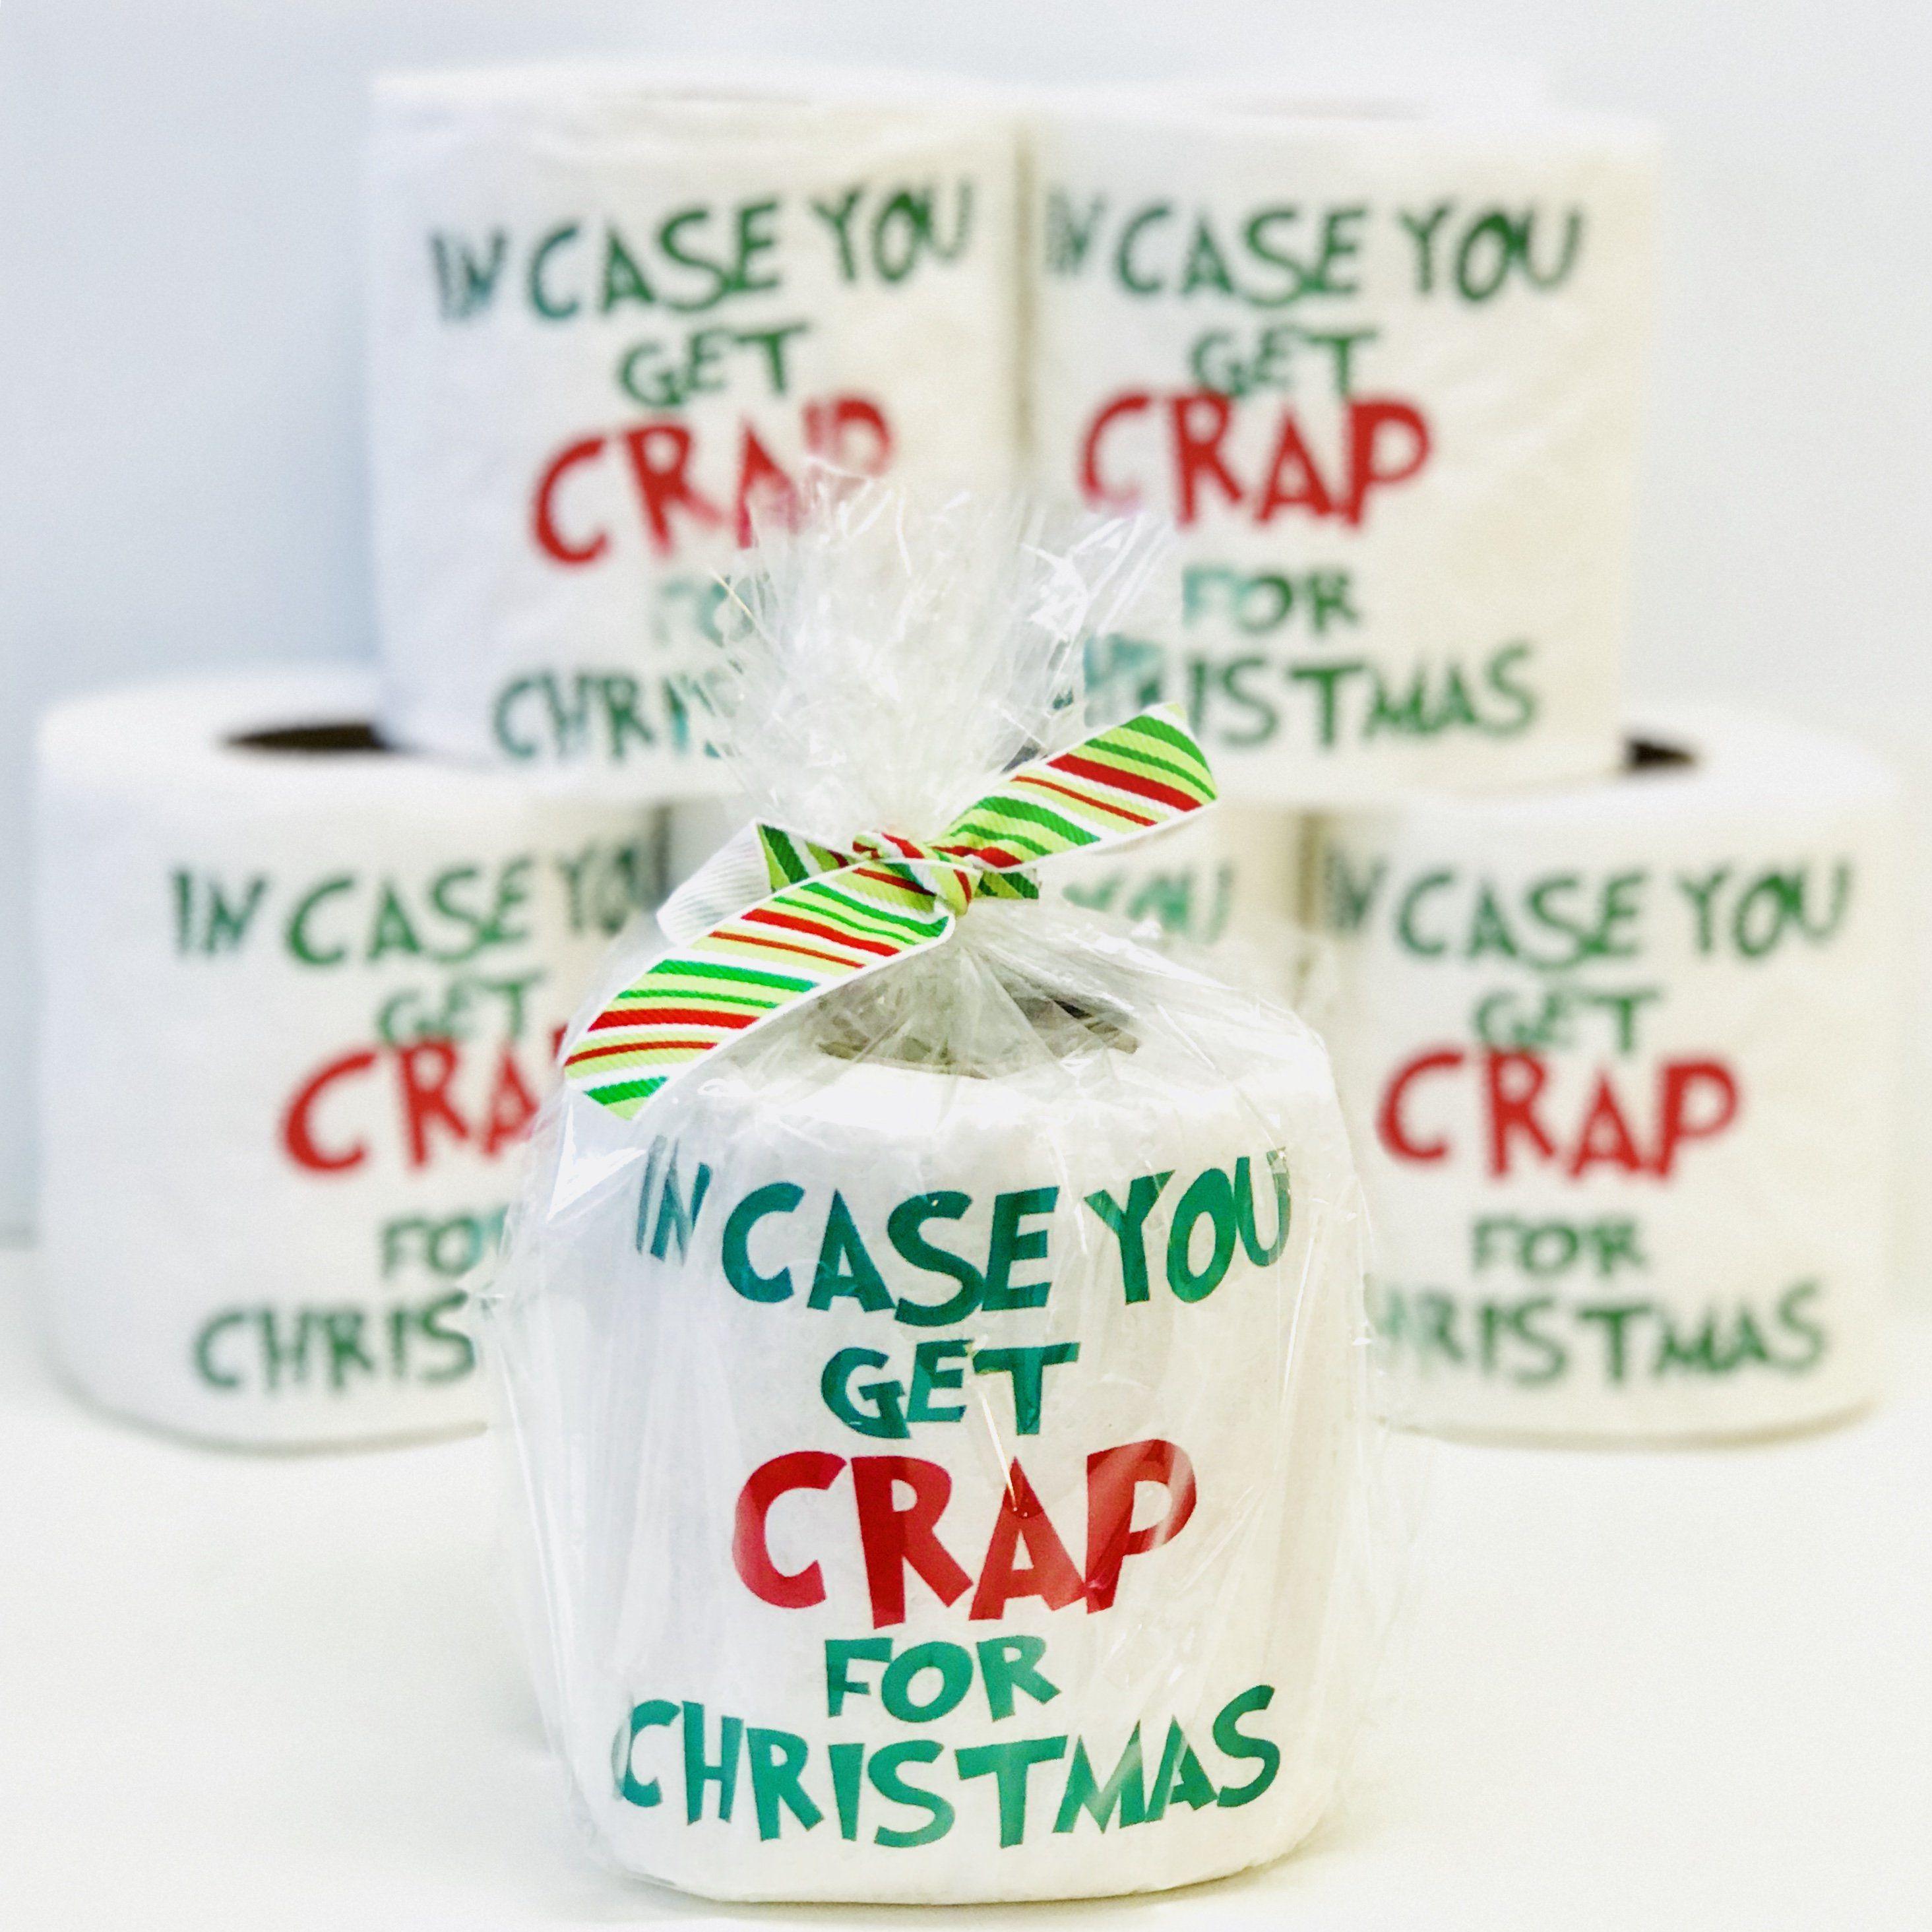 christmas gag gift incase you get crap for christmas gift exchange